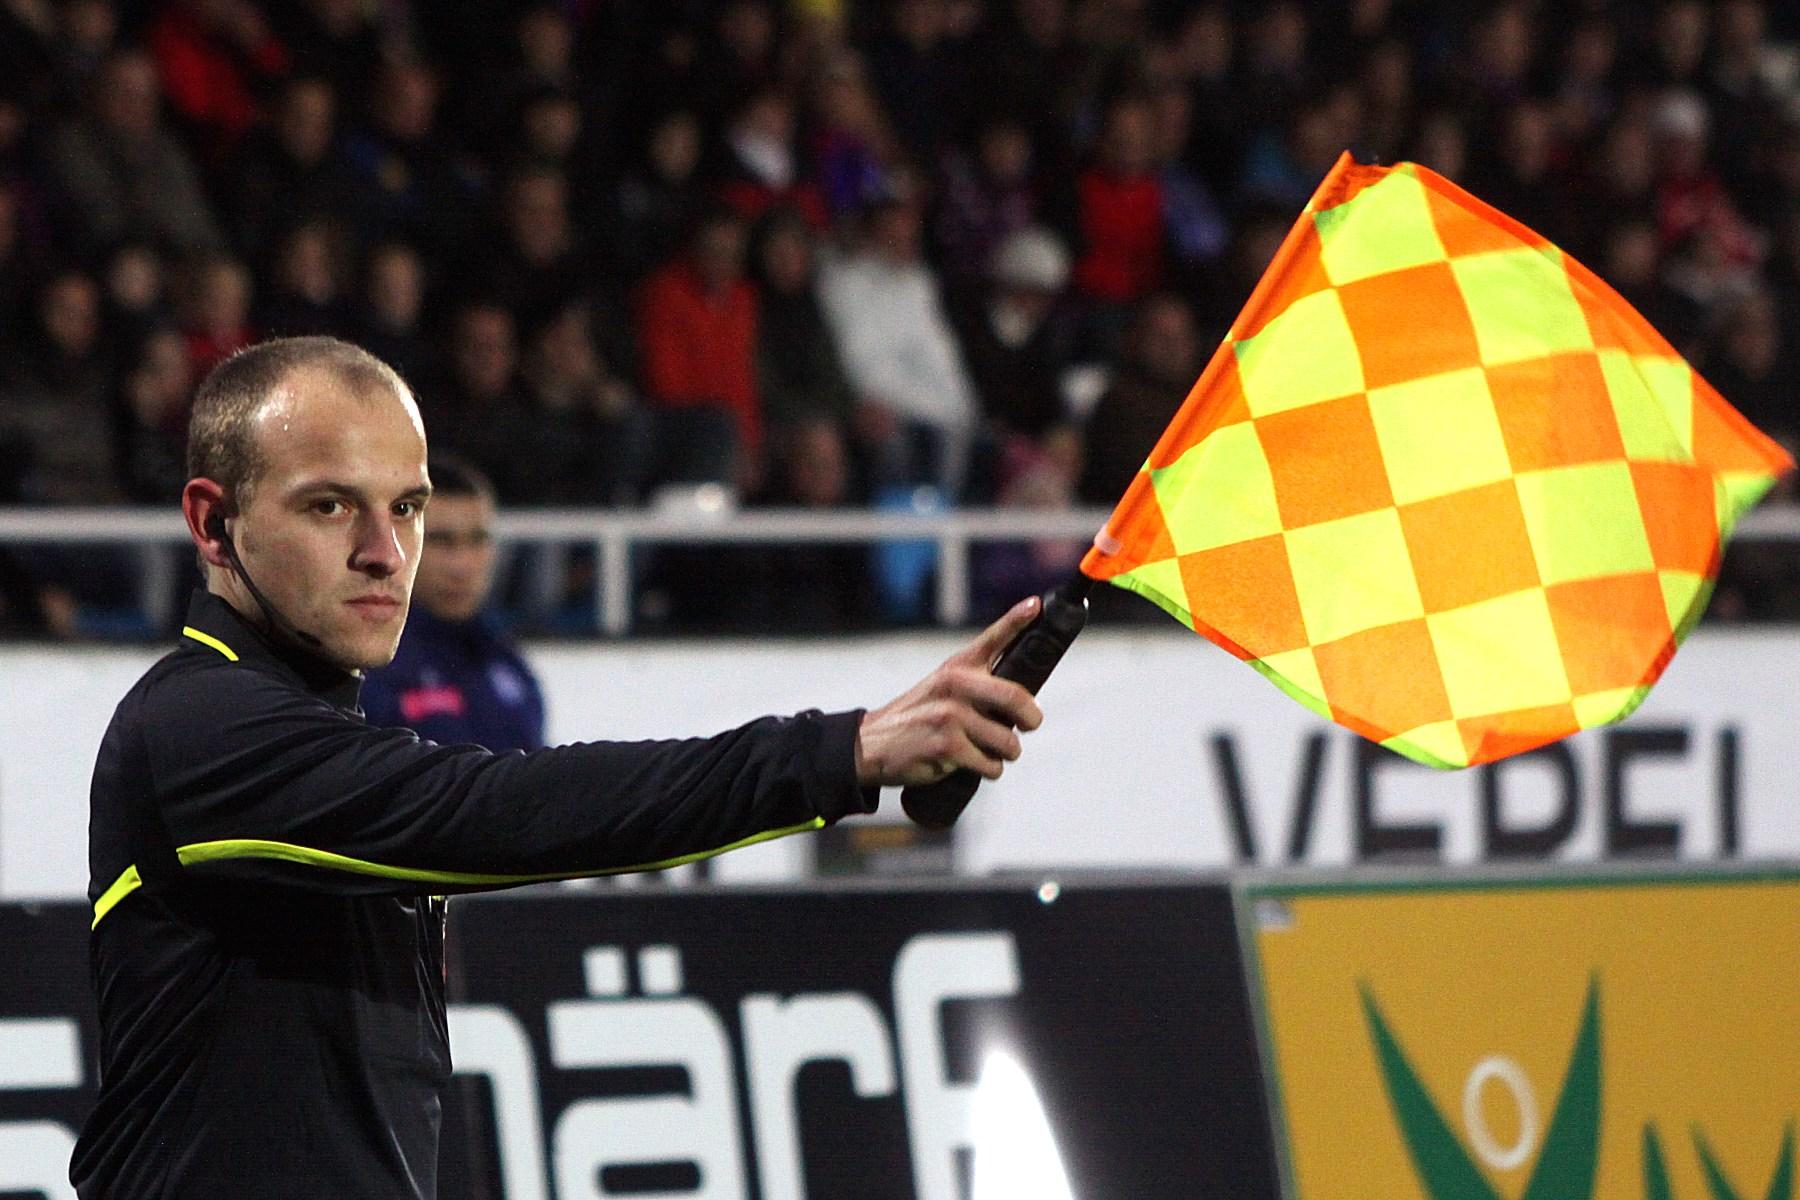 Association football international referees